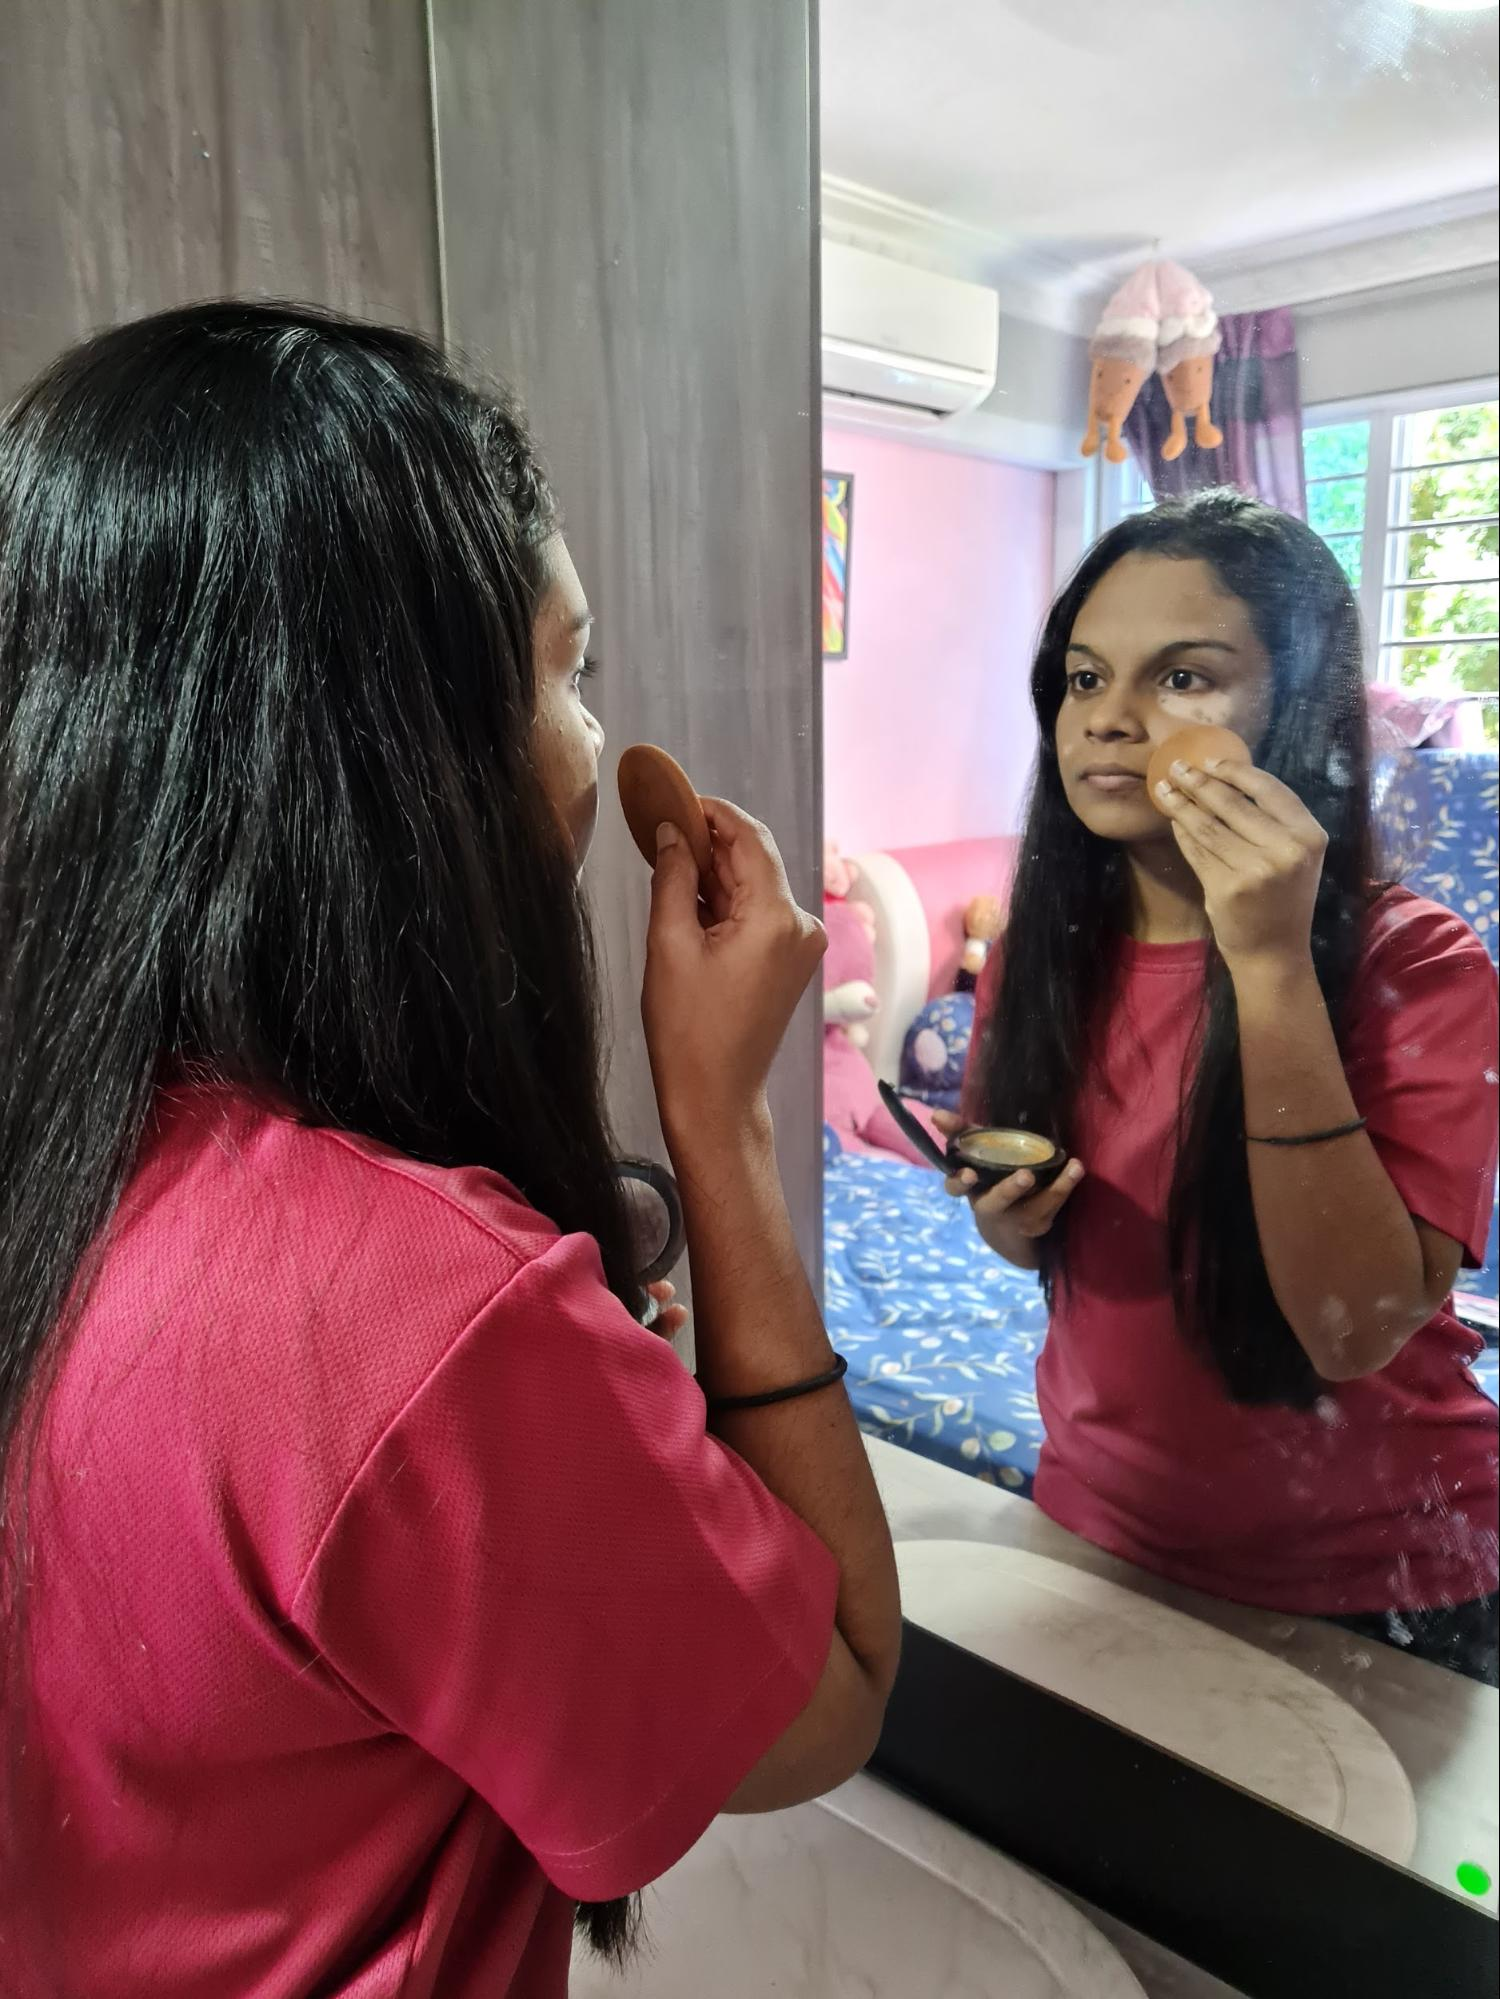 wearing-makeup-vitiligo